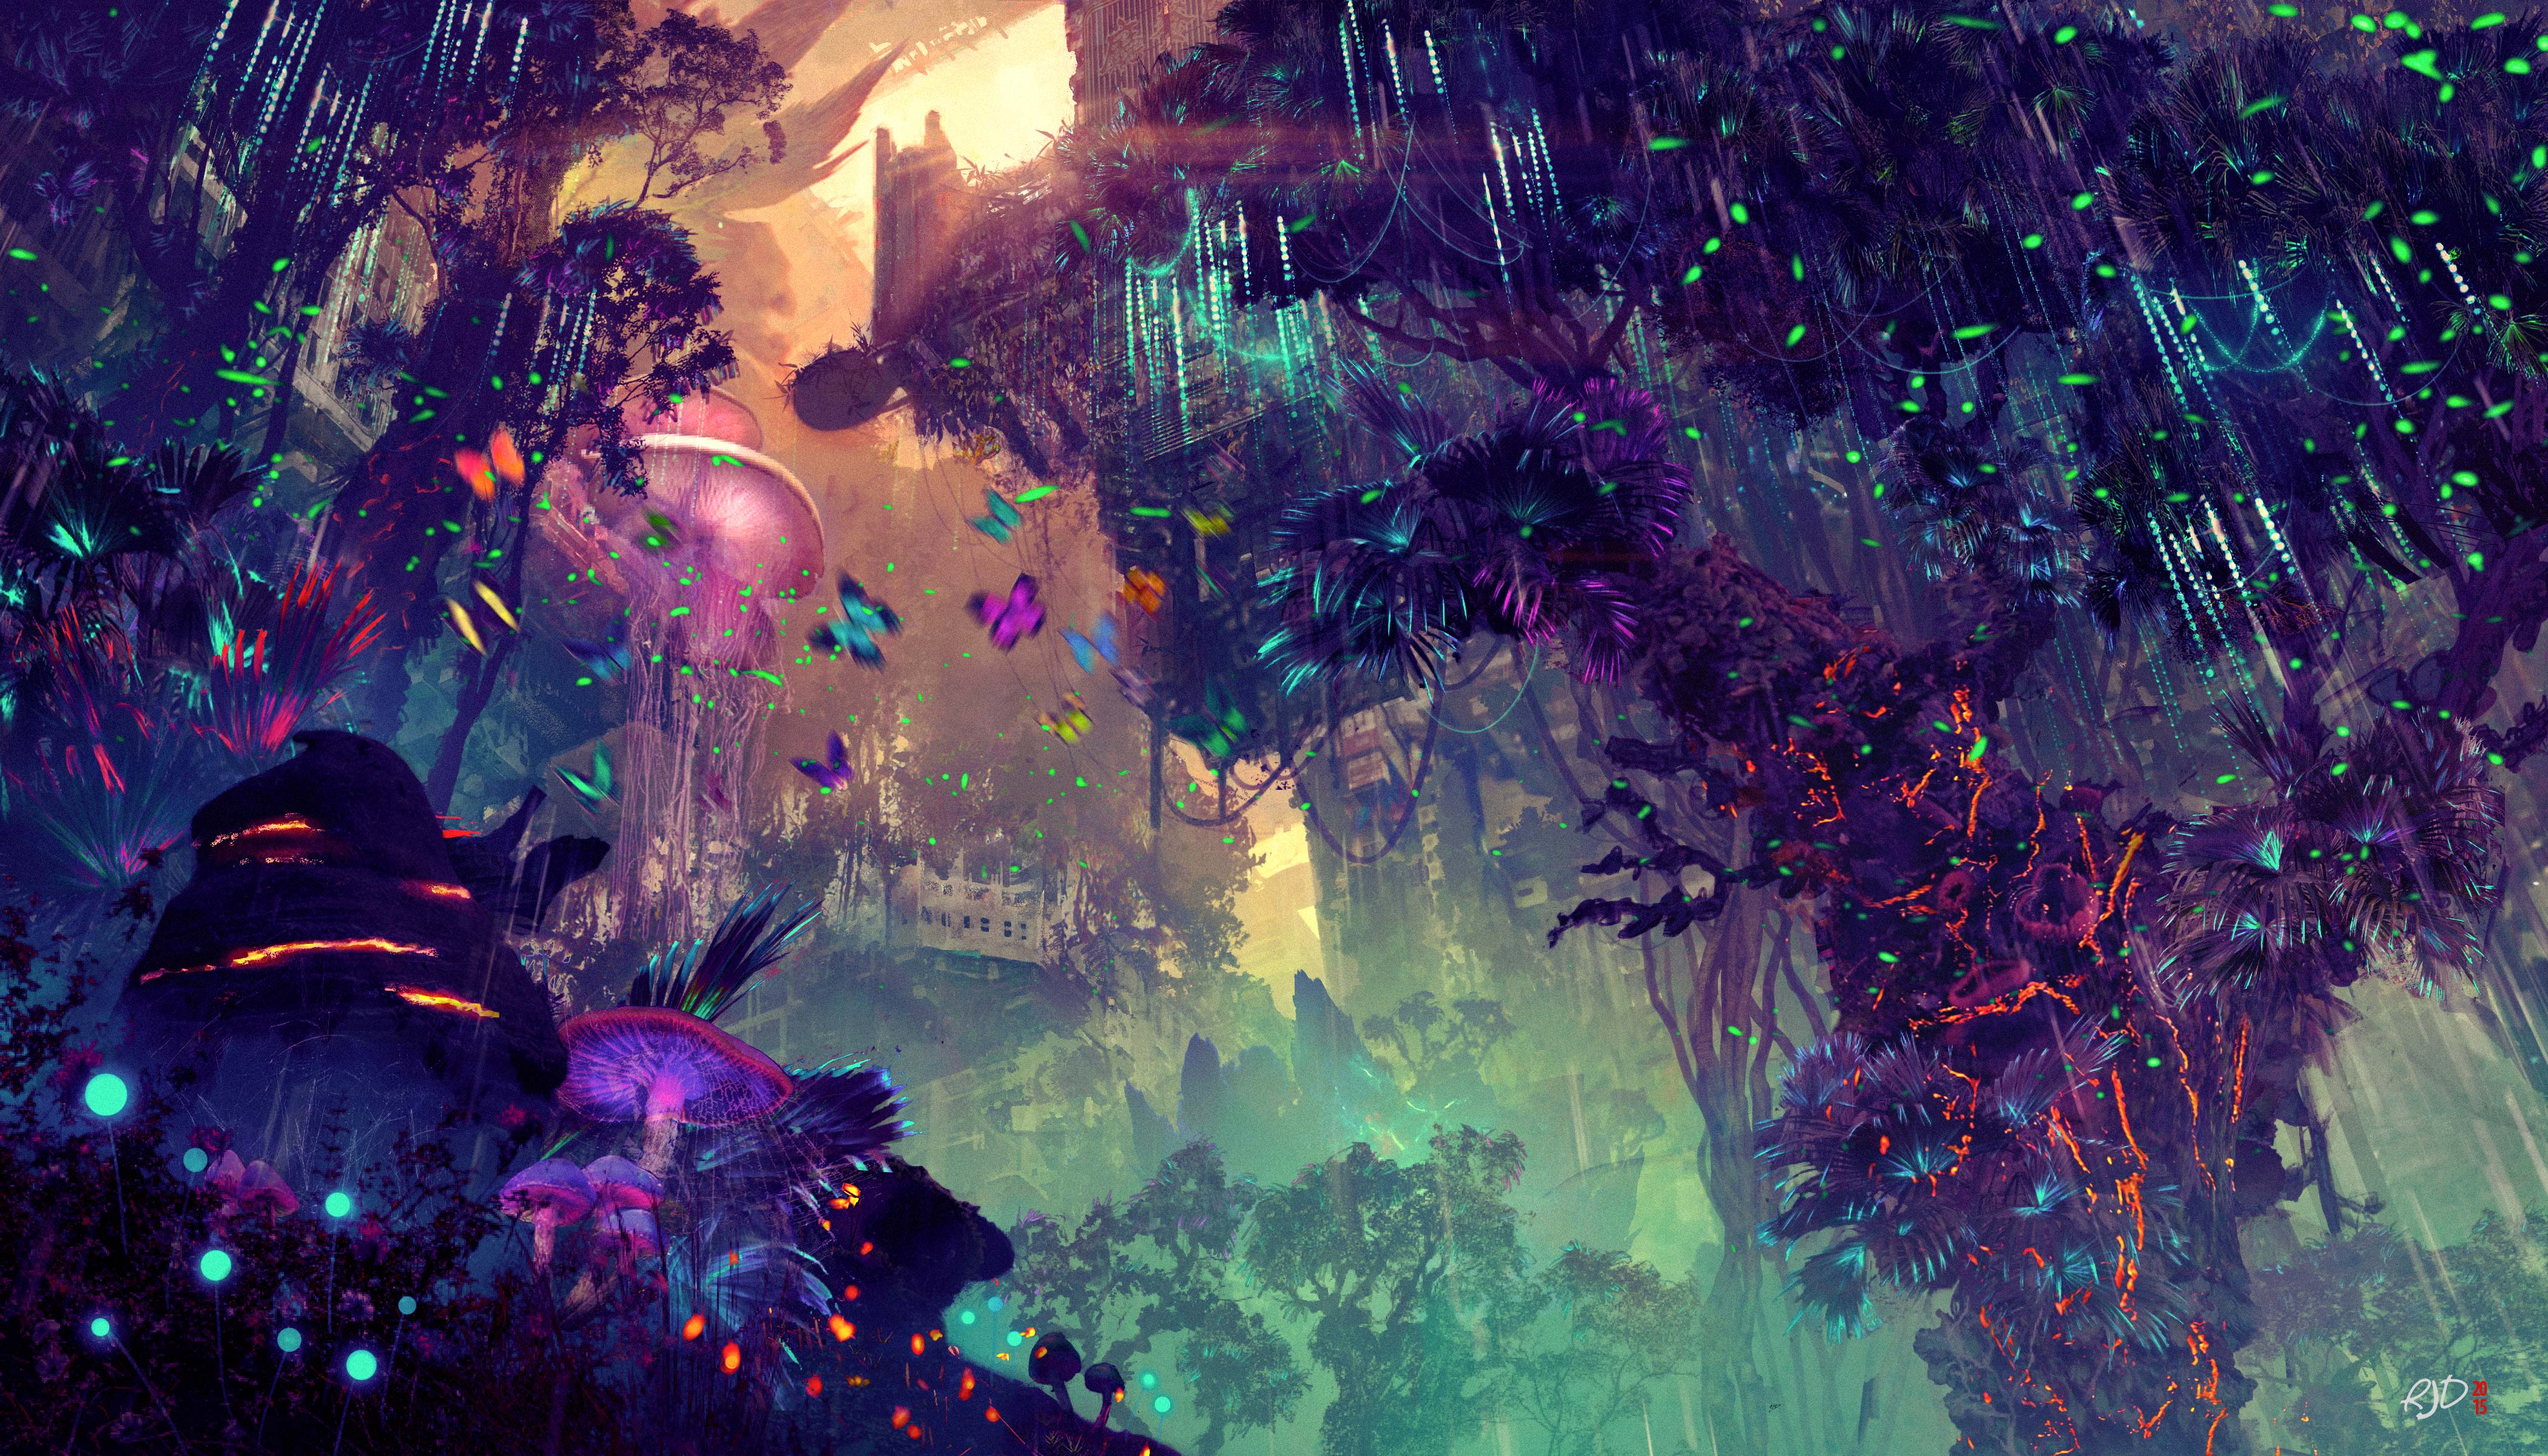 Glowing Forest Colorful Digital Drawing 4k Hd Artist 4k